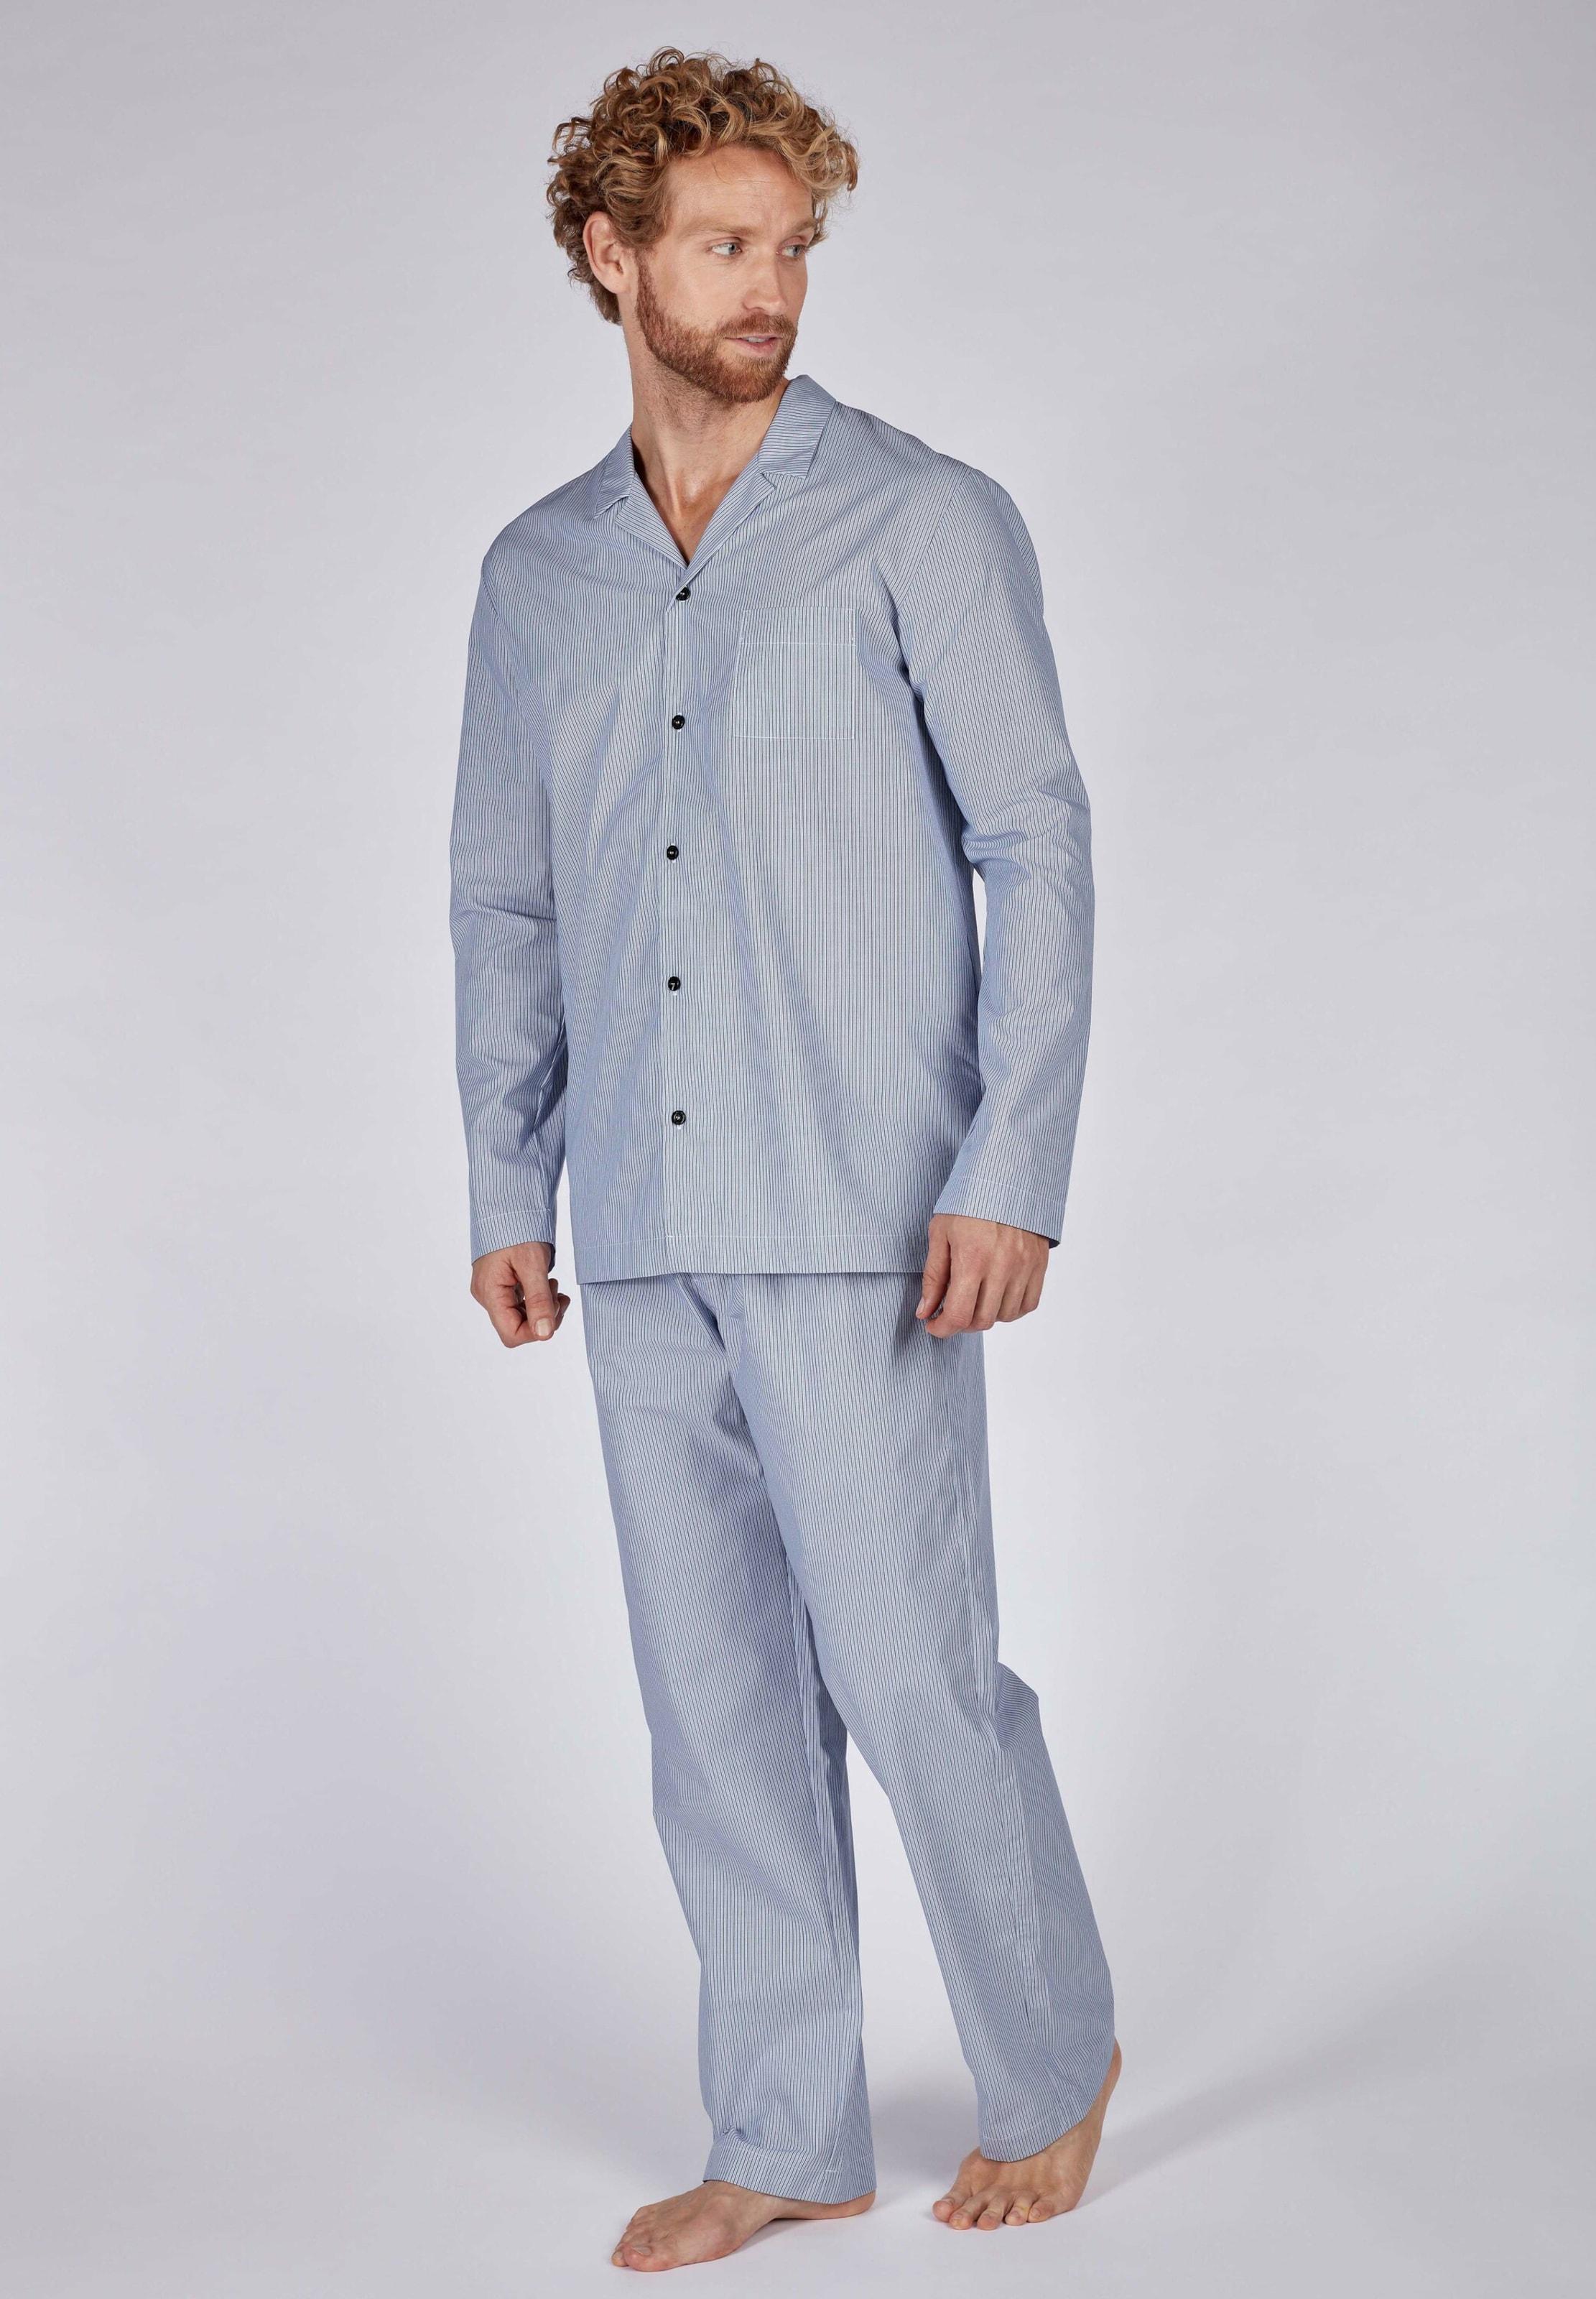 HUBER Pyjama Woven Tender mit Knopfleiste in blau Baumwolle 3207504